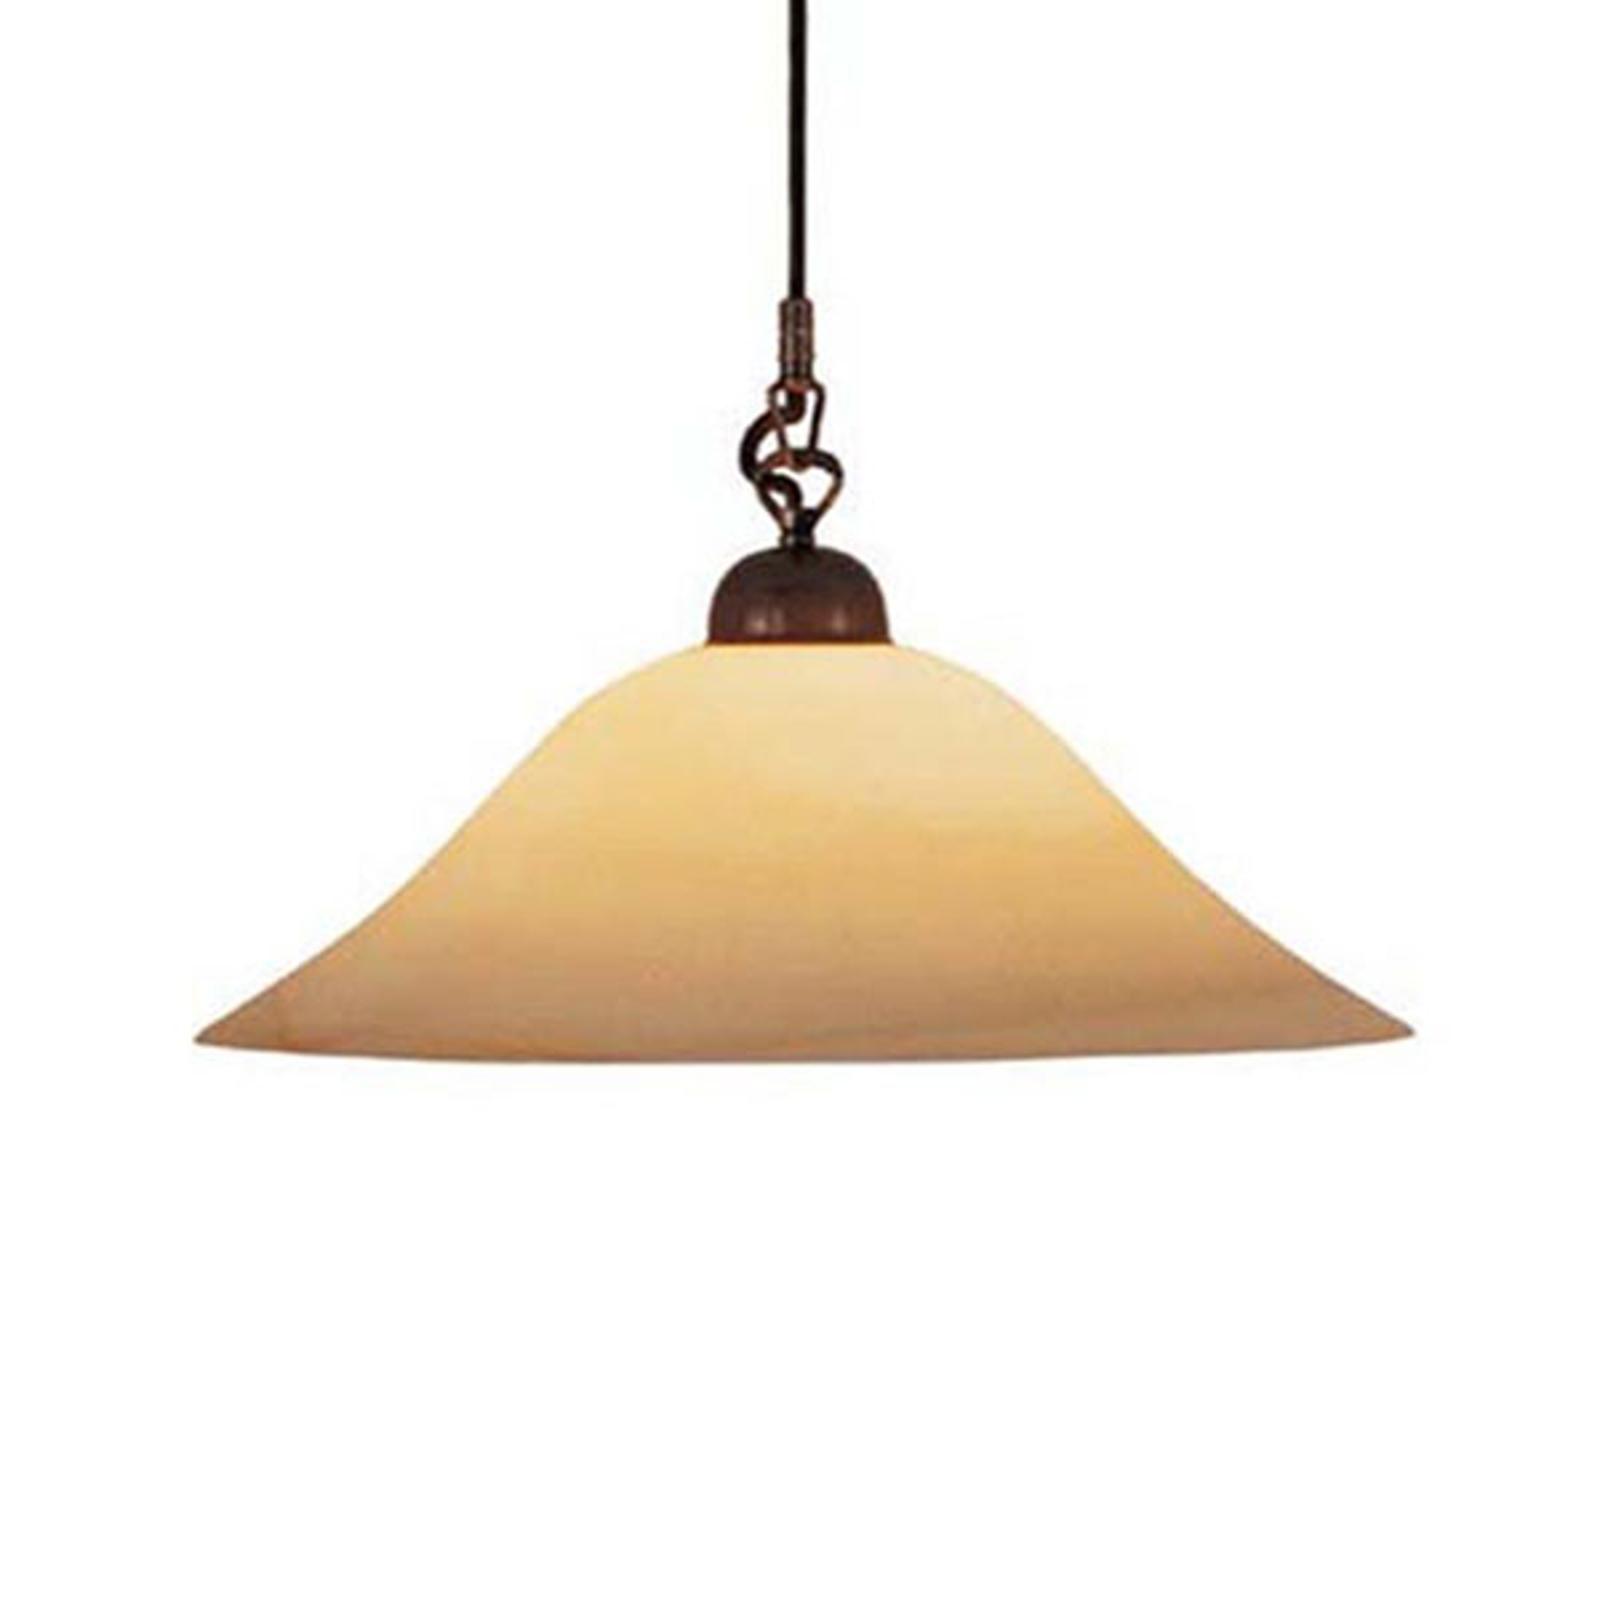 Menzel Anno 1900 hanglamp m. Scavo-rookglas Ø 42cm